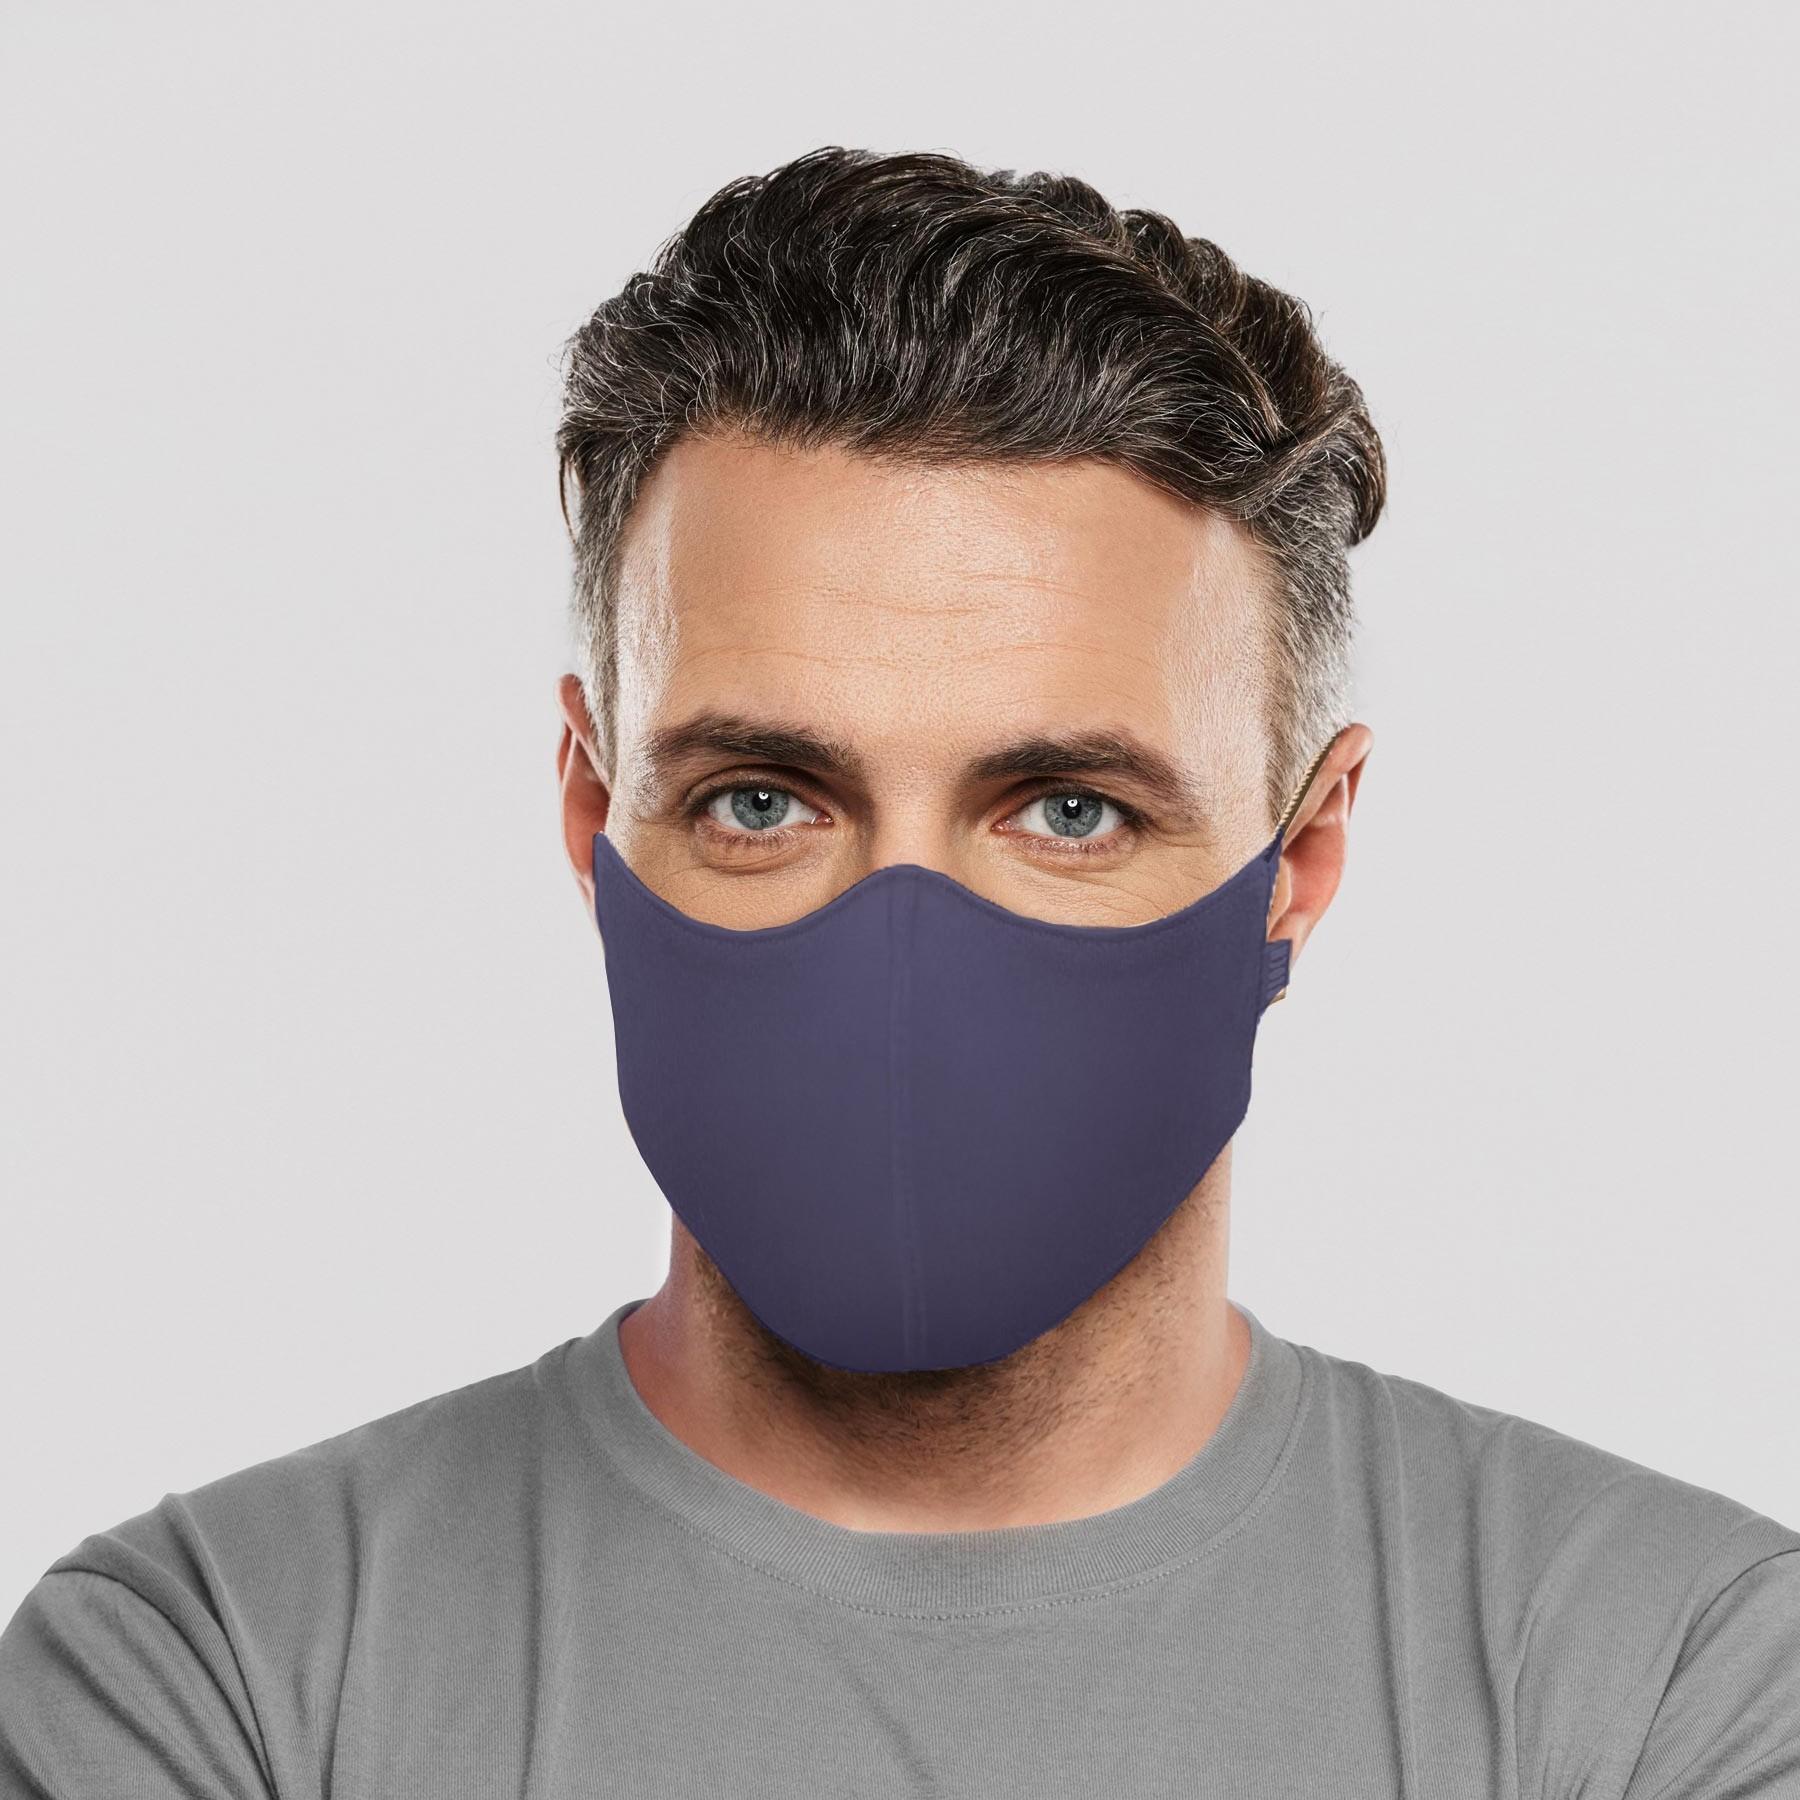 Bloch B-Safe Adult Face Mask 3 Pack Navy